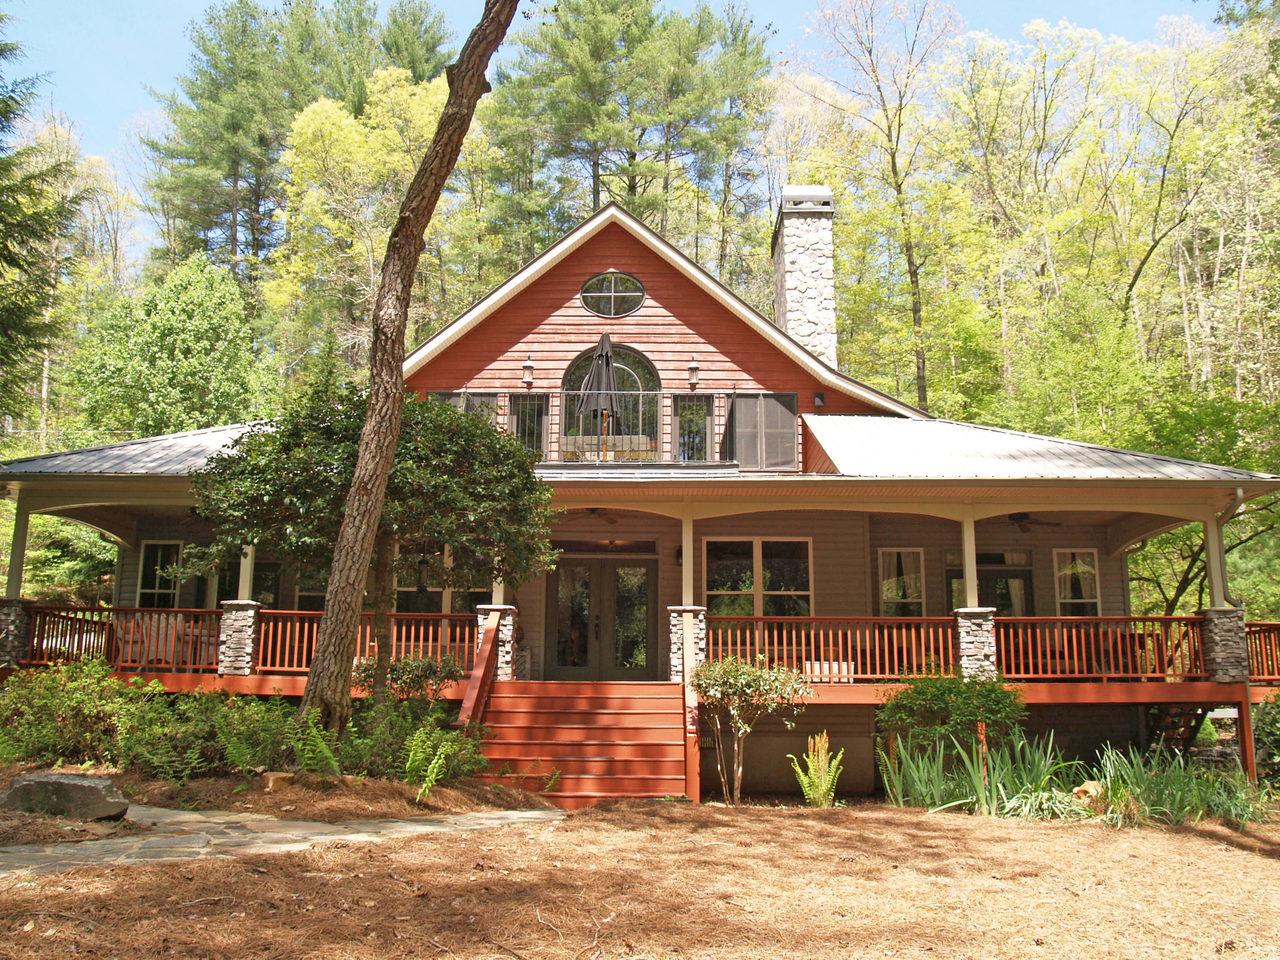 443 River Drive, Dahlonega, Georgia 30533